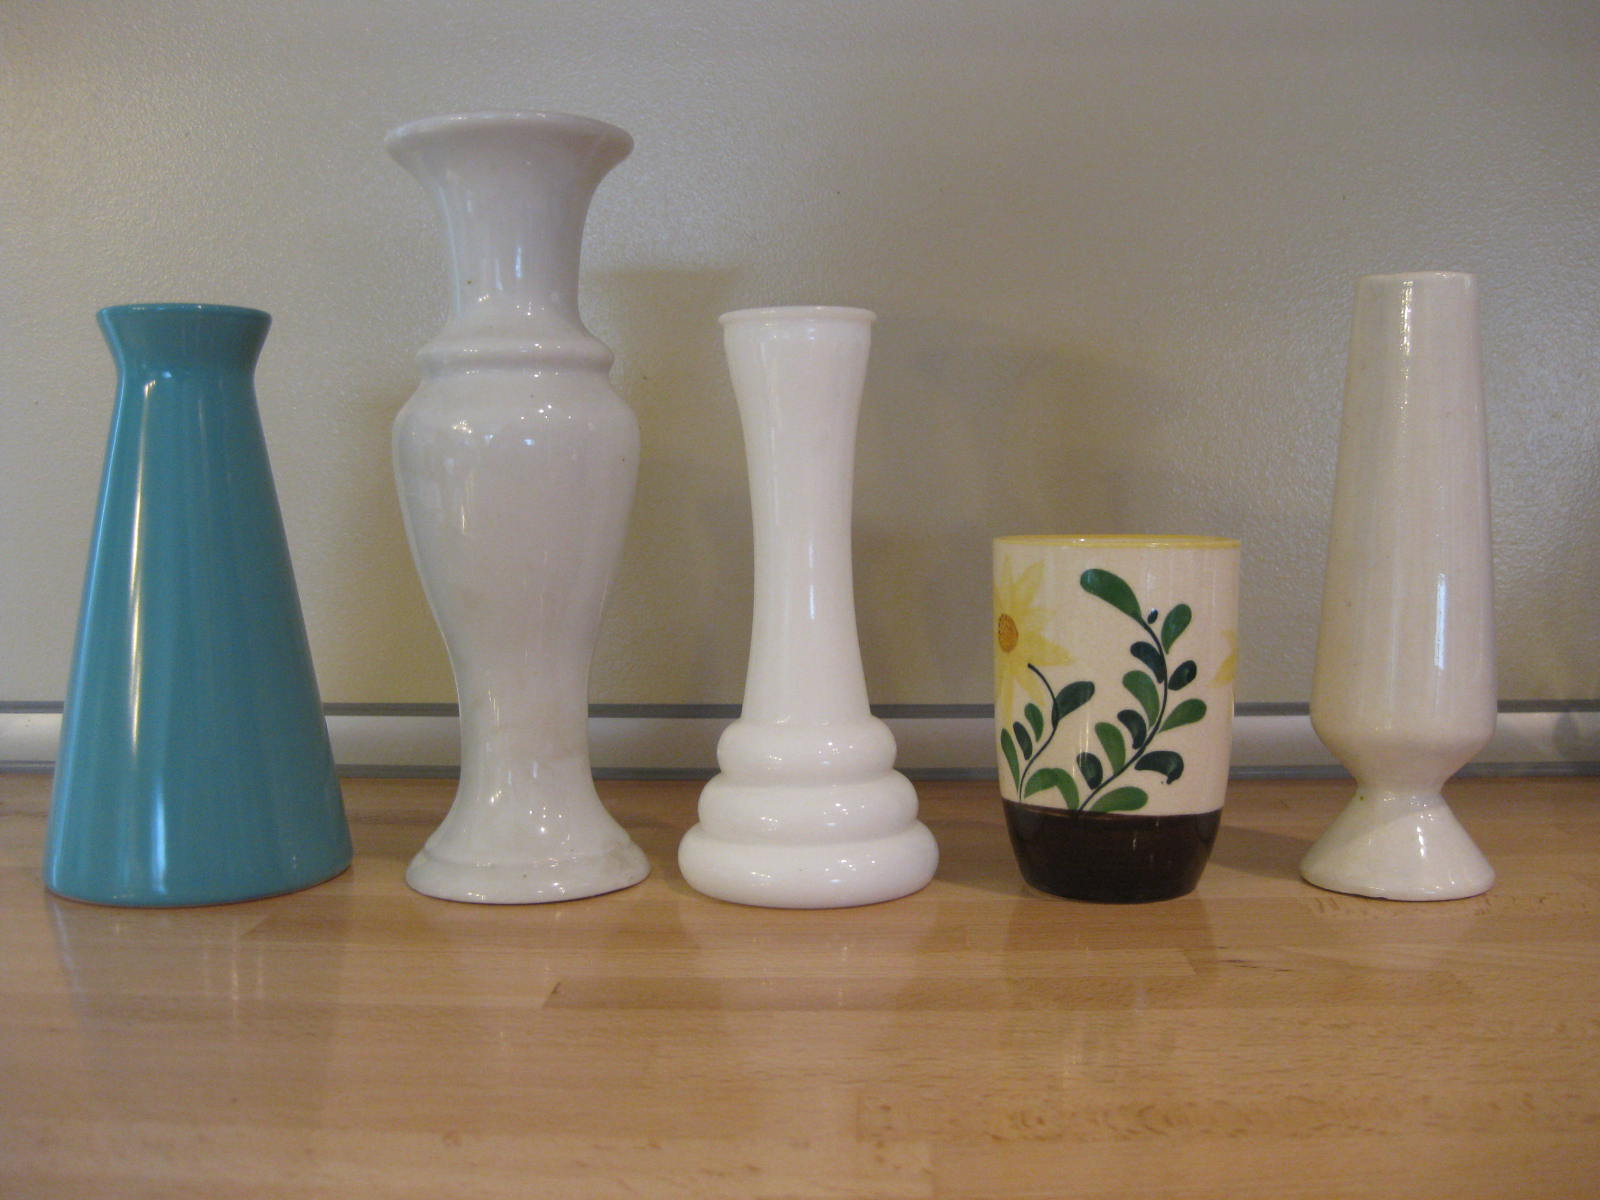 H is for handmade multiple vase centerpiece tutorial